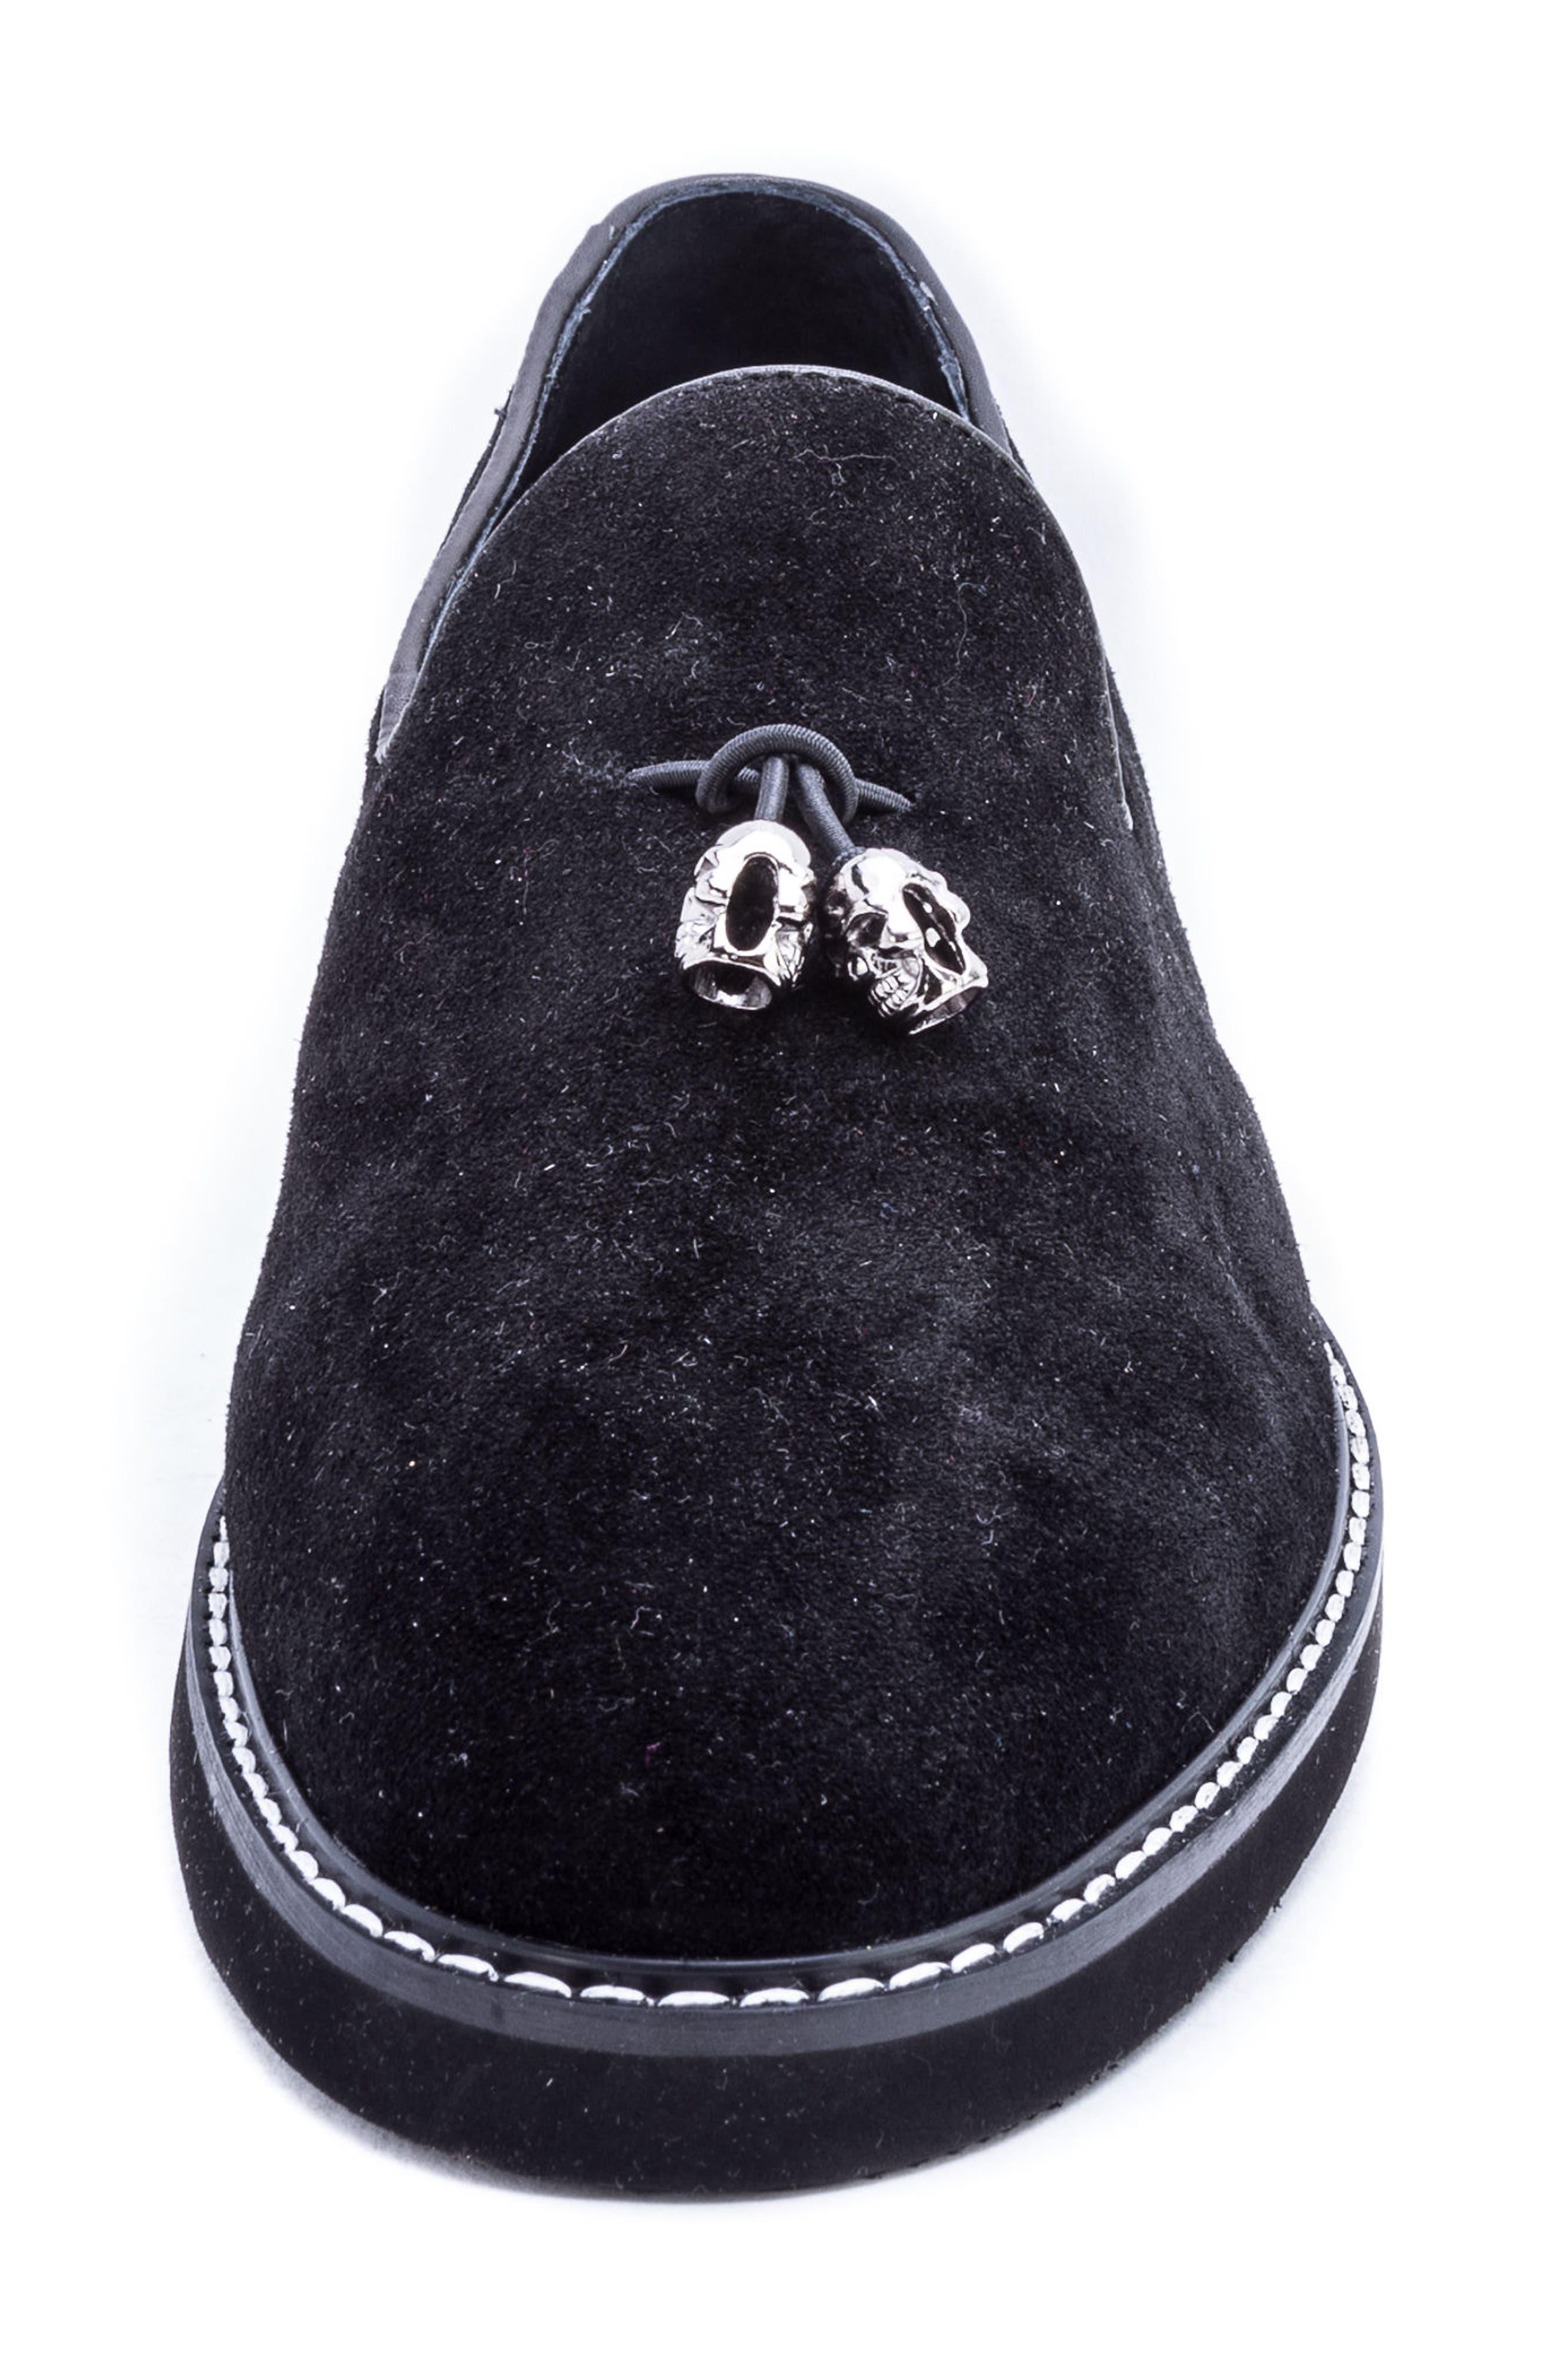 Badgley Mischka Heston Tassel Loafer,                             Alternate thumbnail 4, color,                             BLACK SUEDE